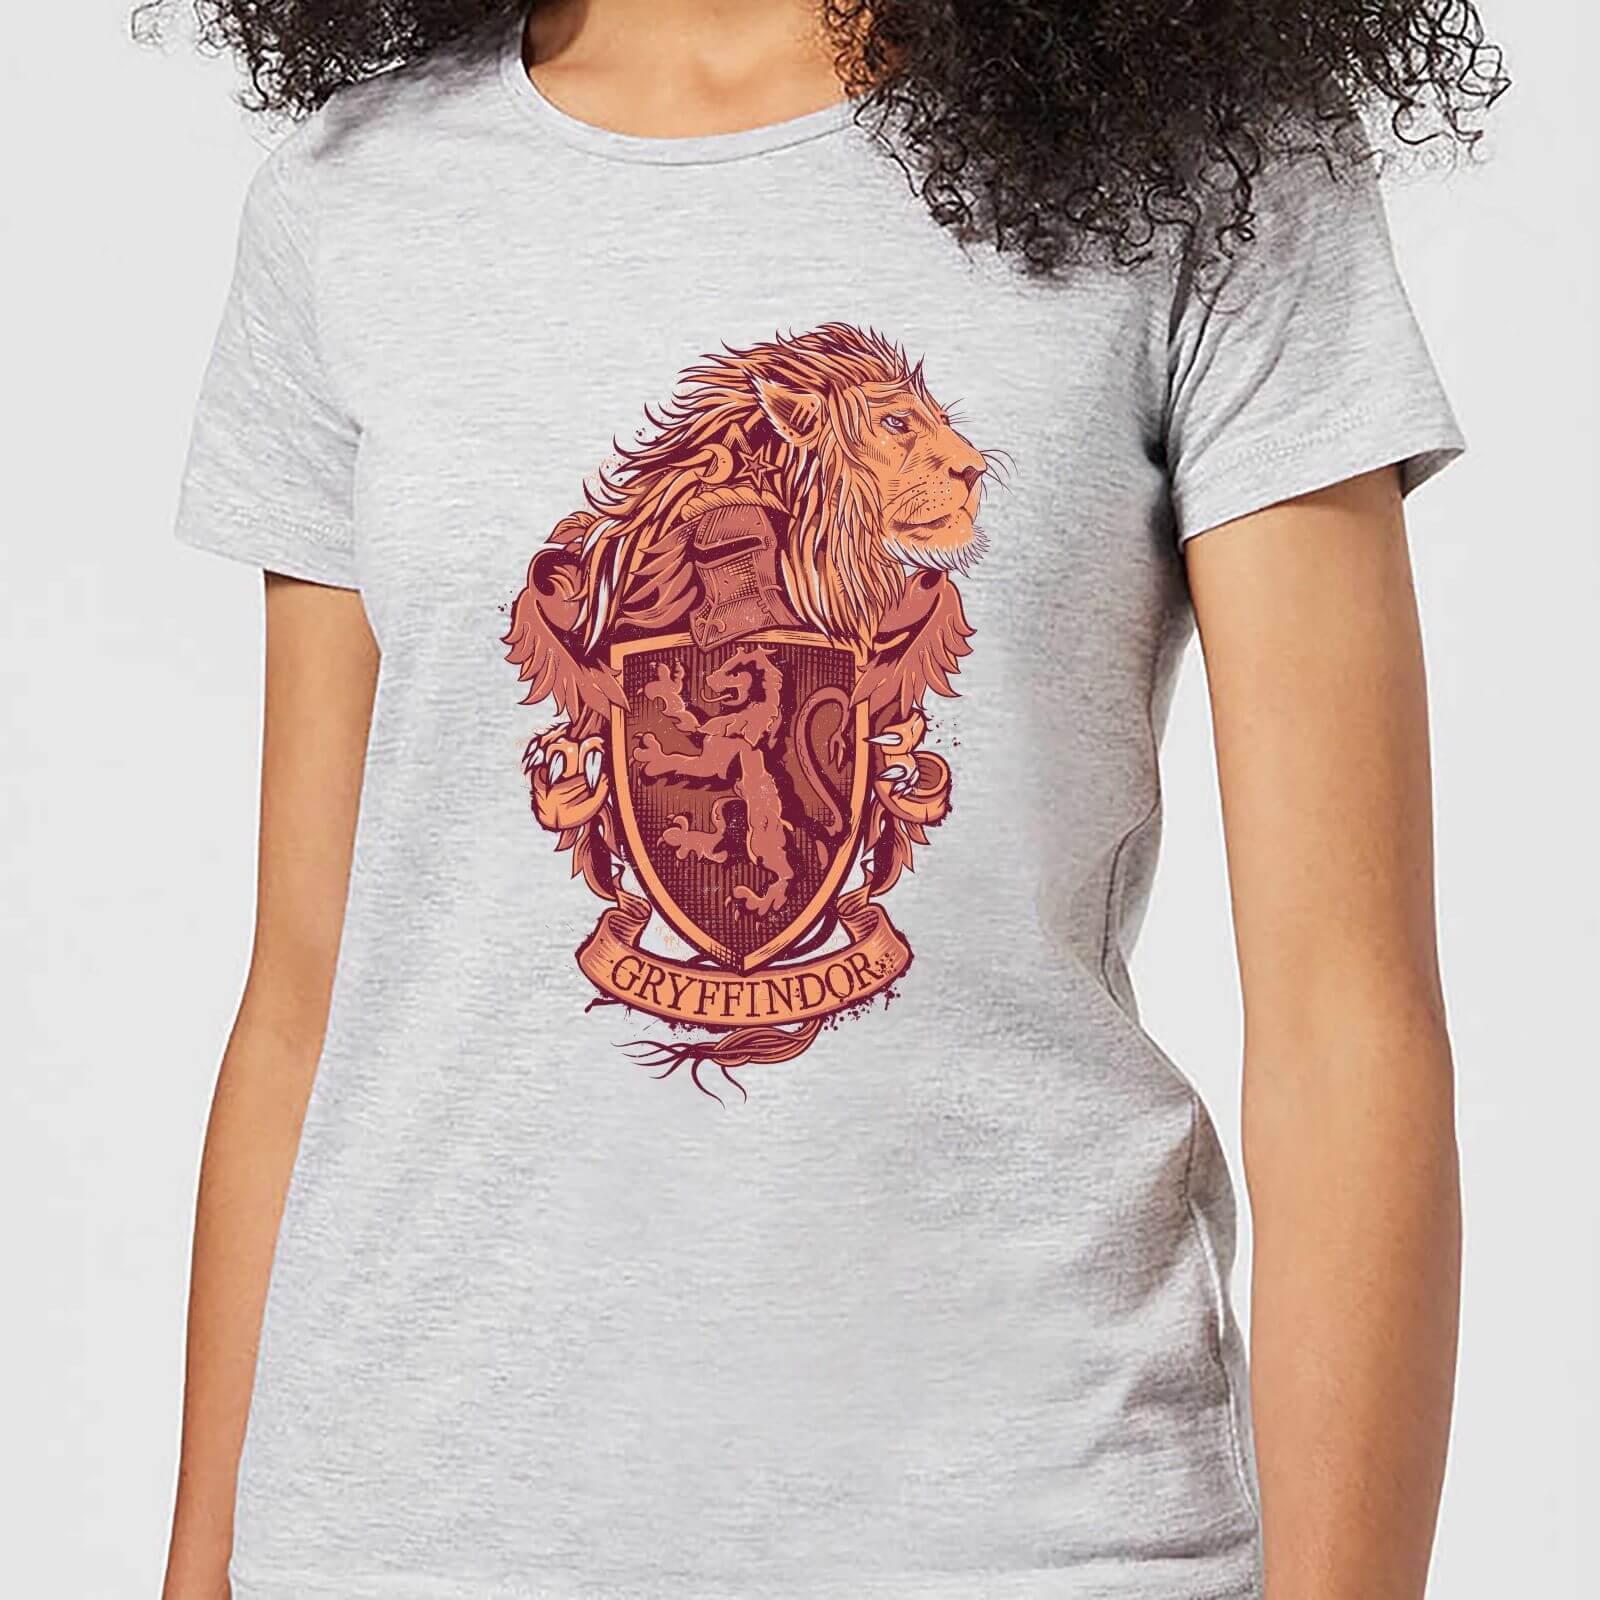 Harry Potter Gryffindor Drawn Crest Women's T-Shirt - Grey - L - Gris